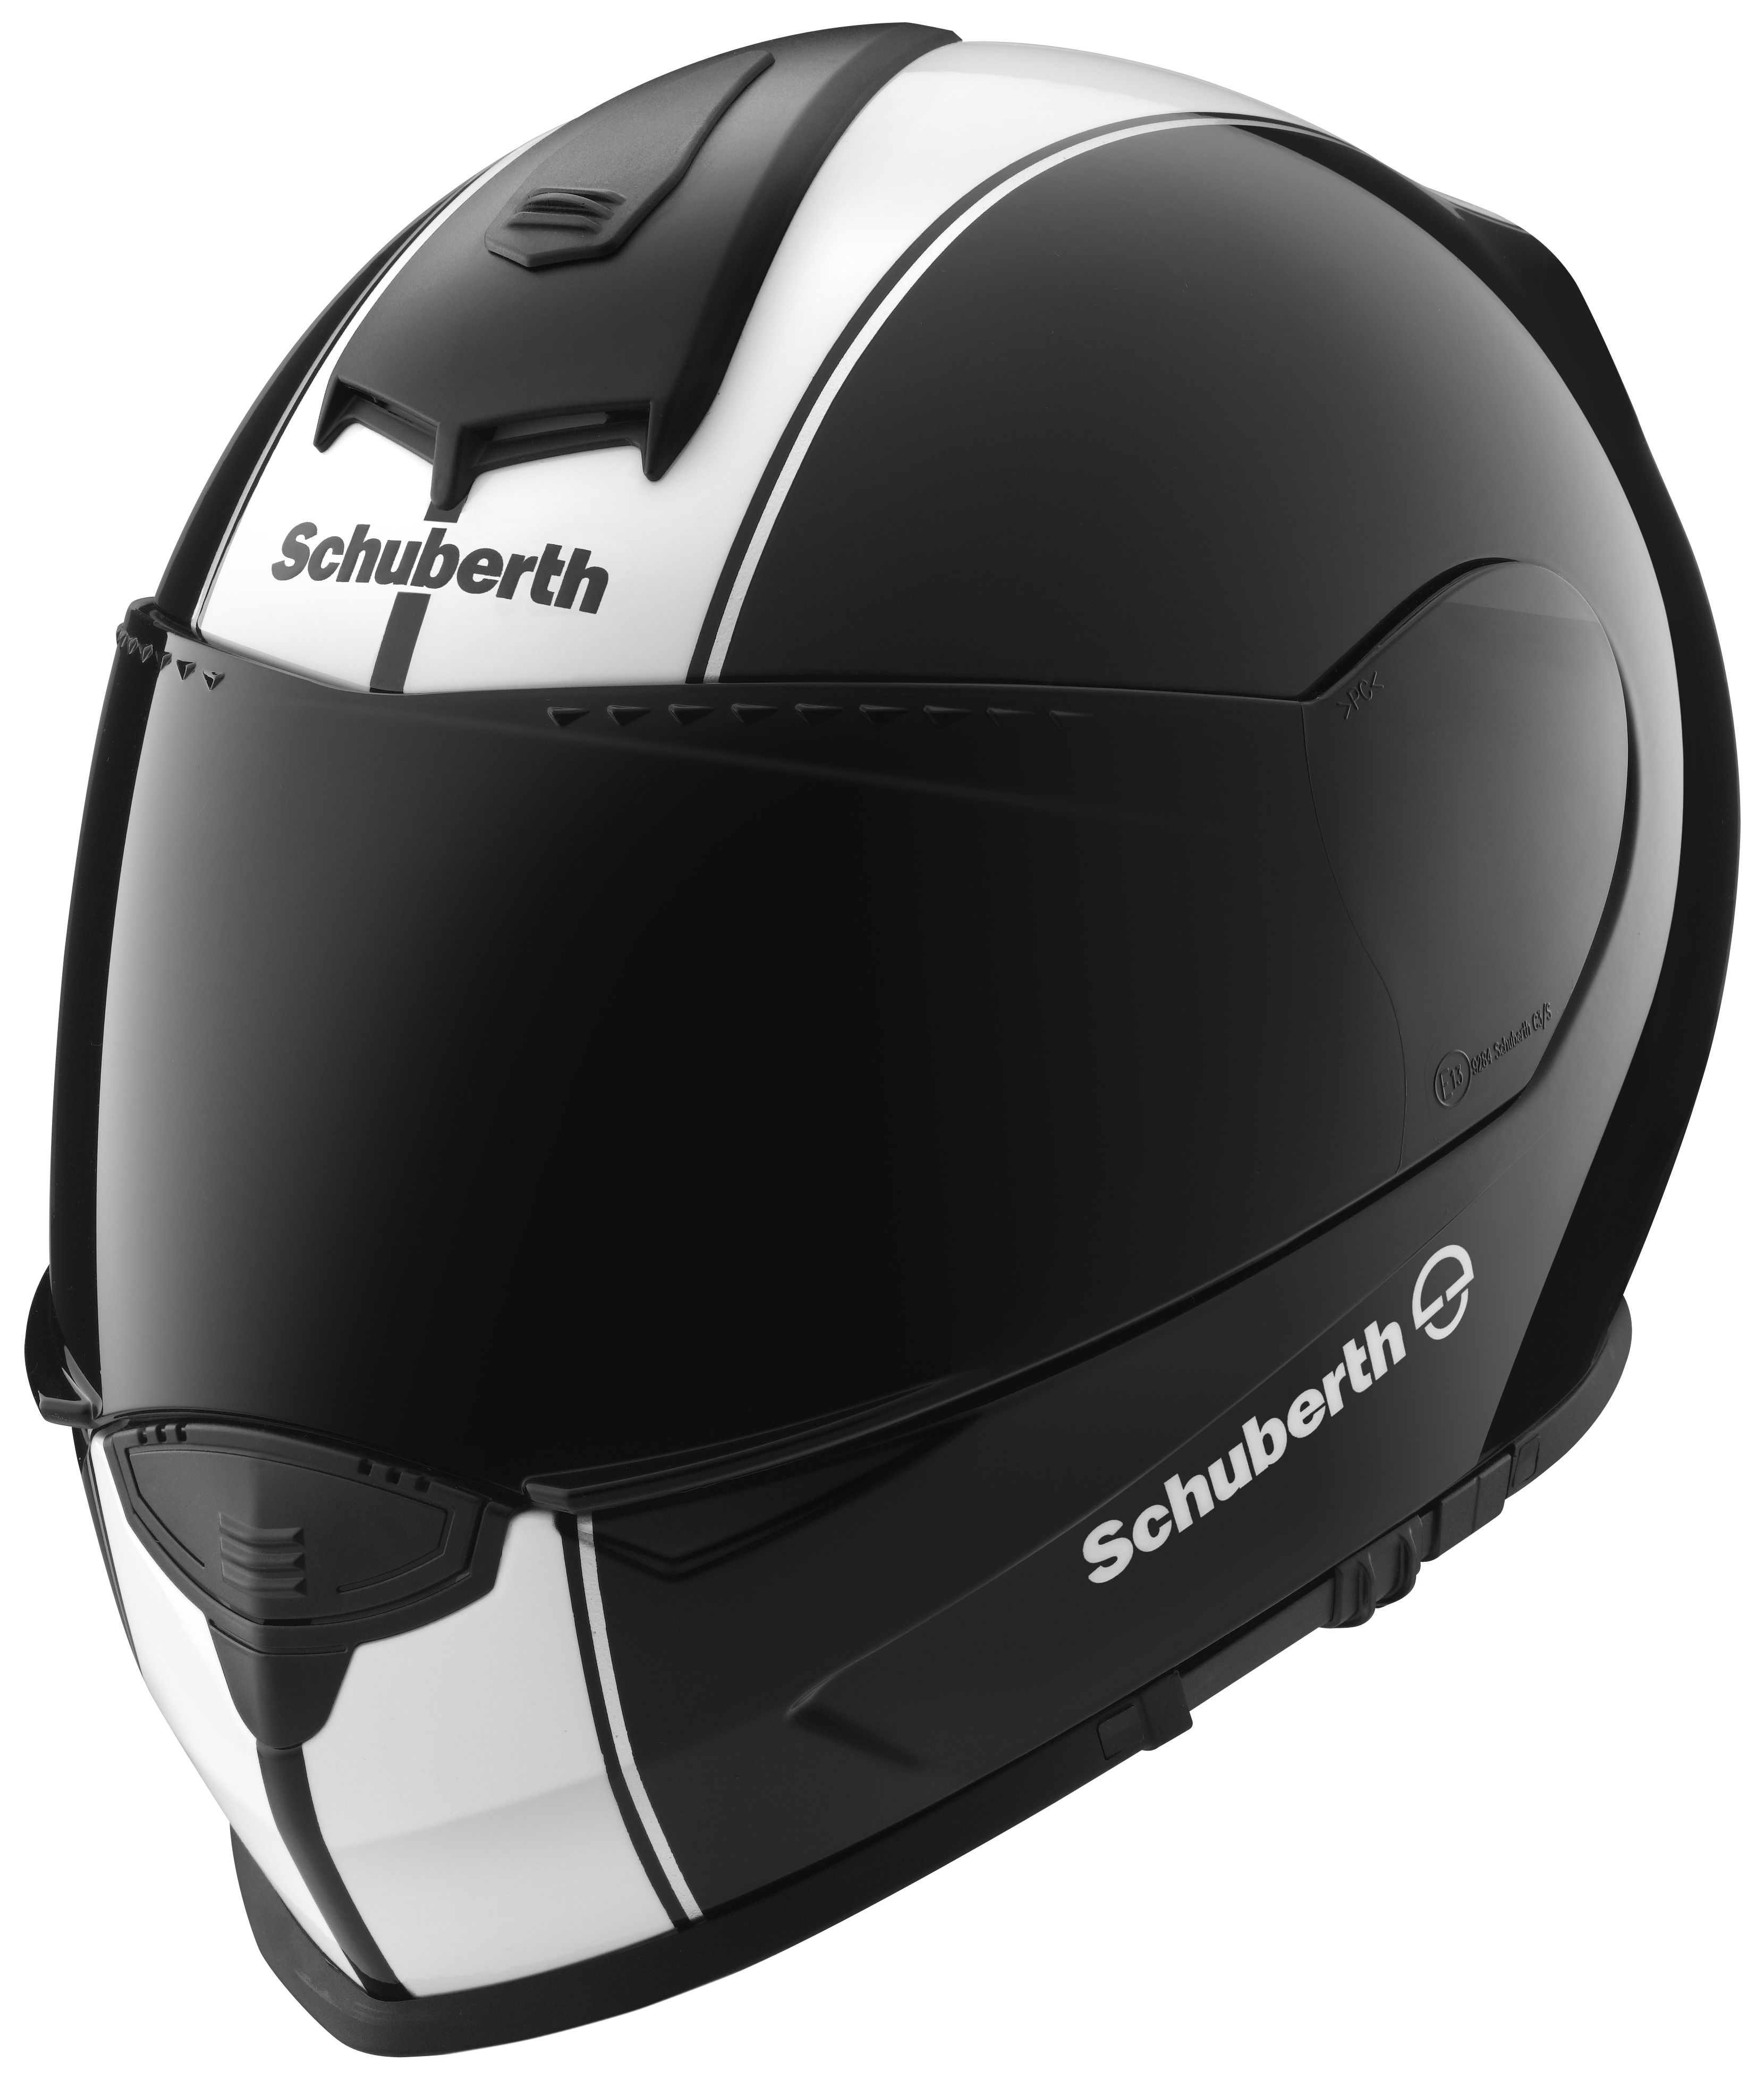 schuberth s2 lines helmet size 3xl only revzilla. Black Bedroom Furniture Sets. Home Design Ideas